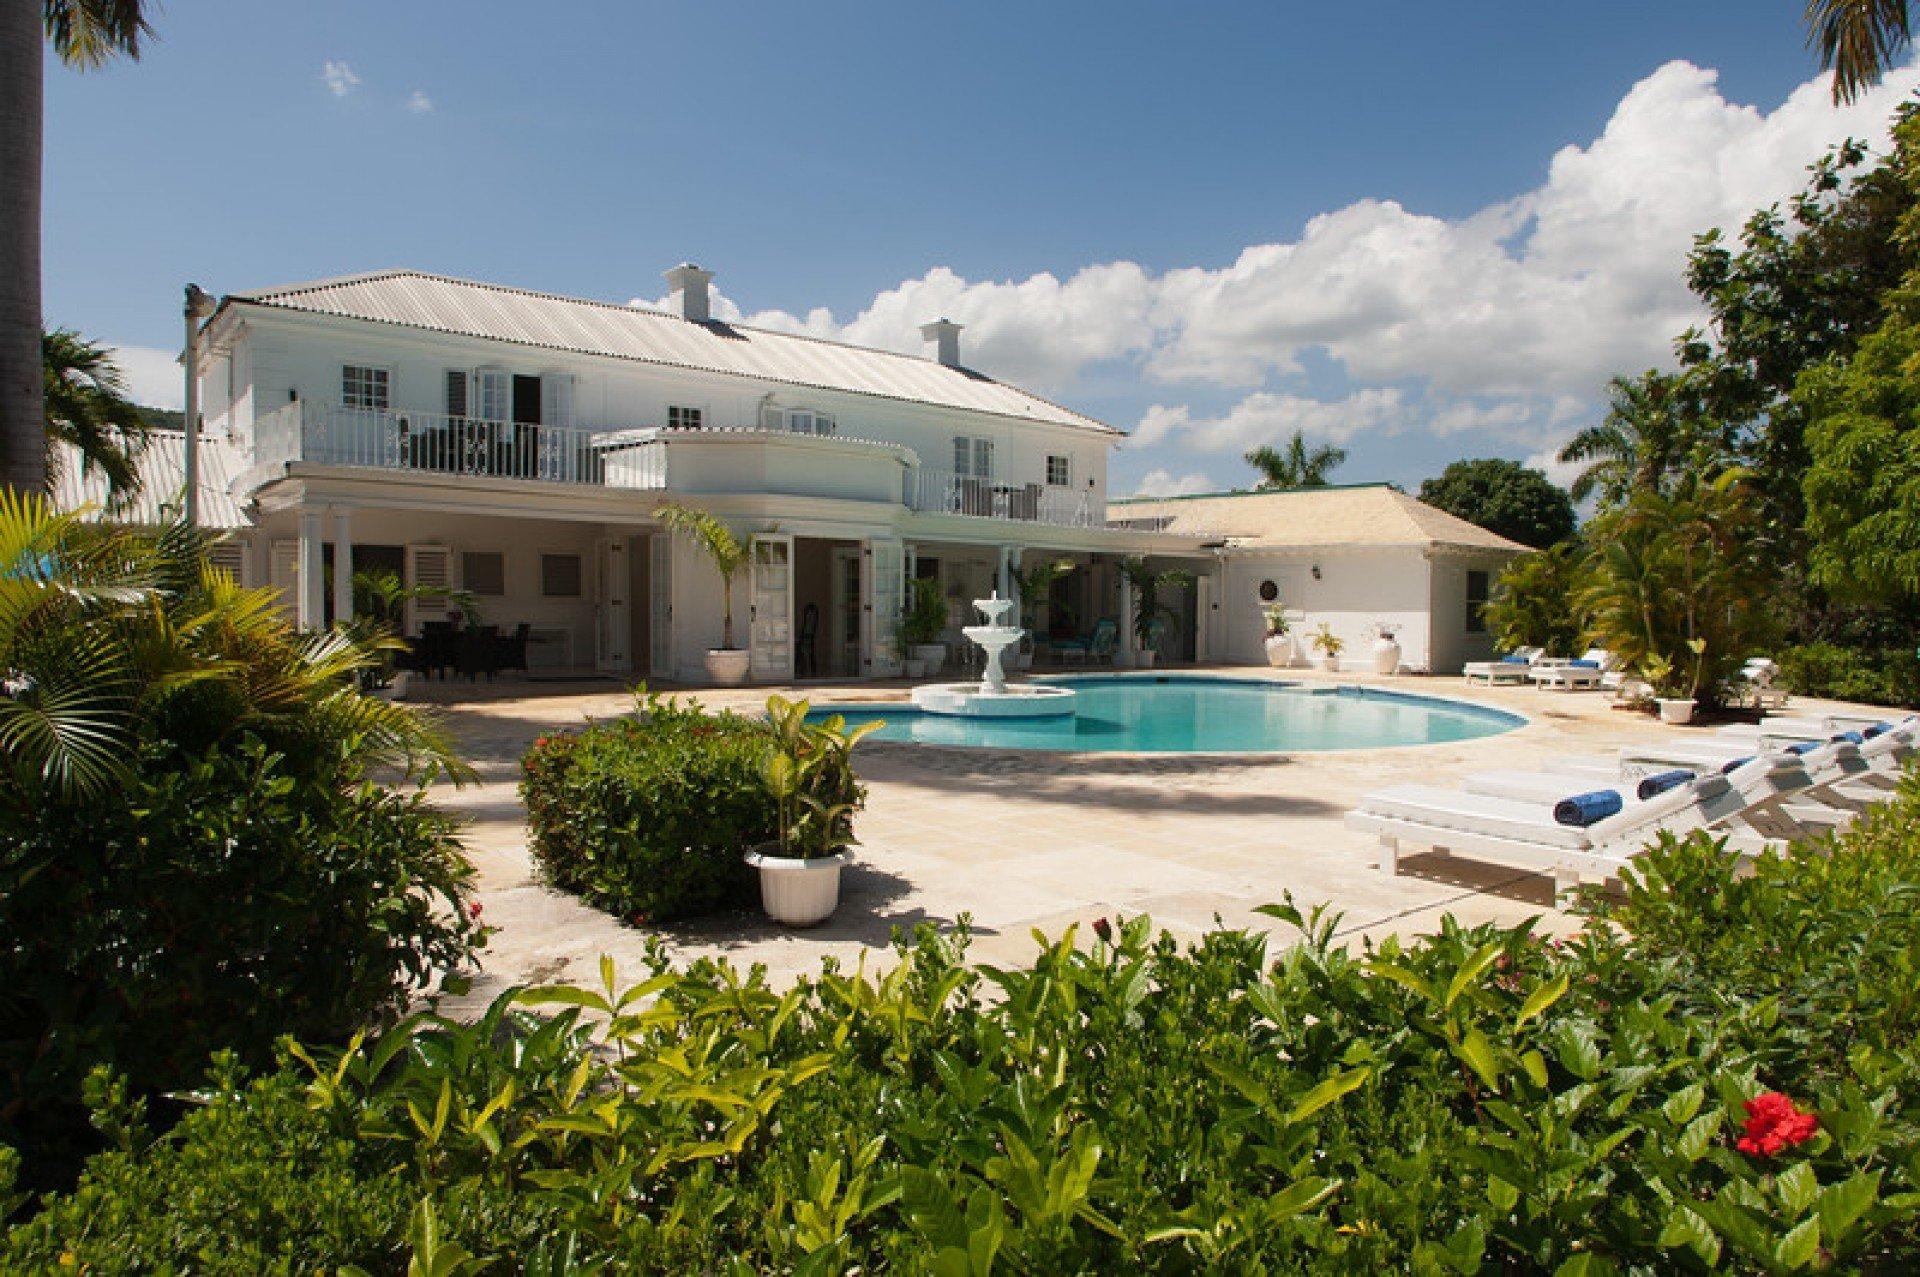 Summertime Villa Summertime Jamaica Isle Blue